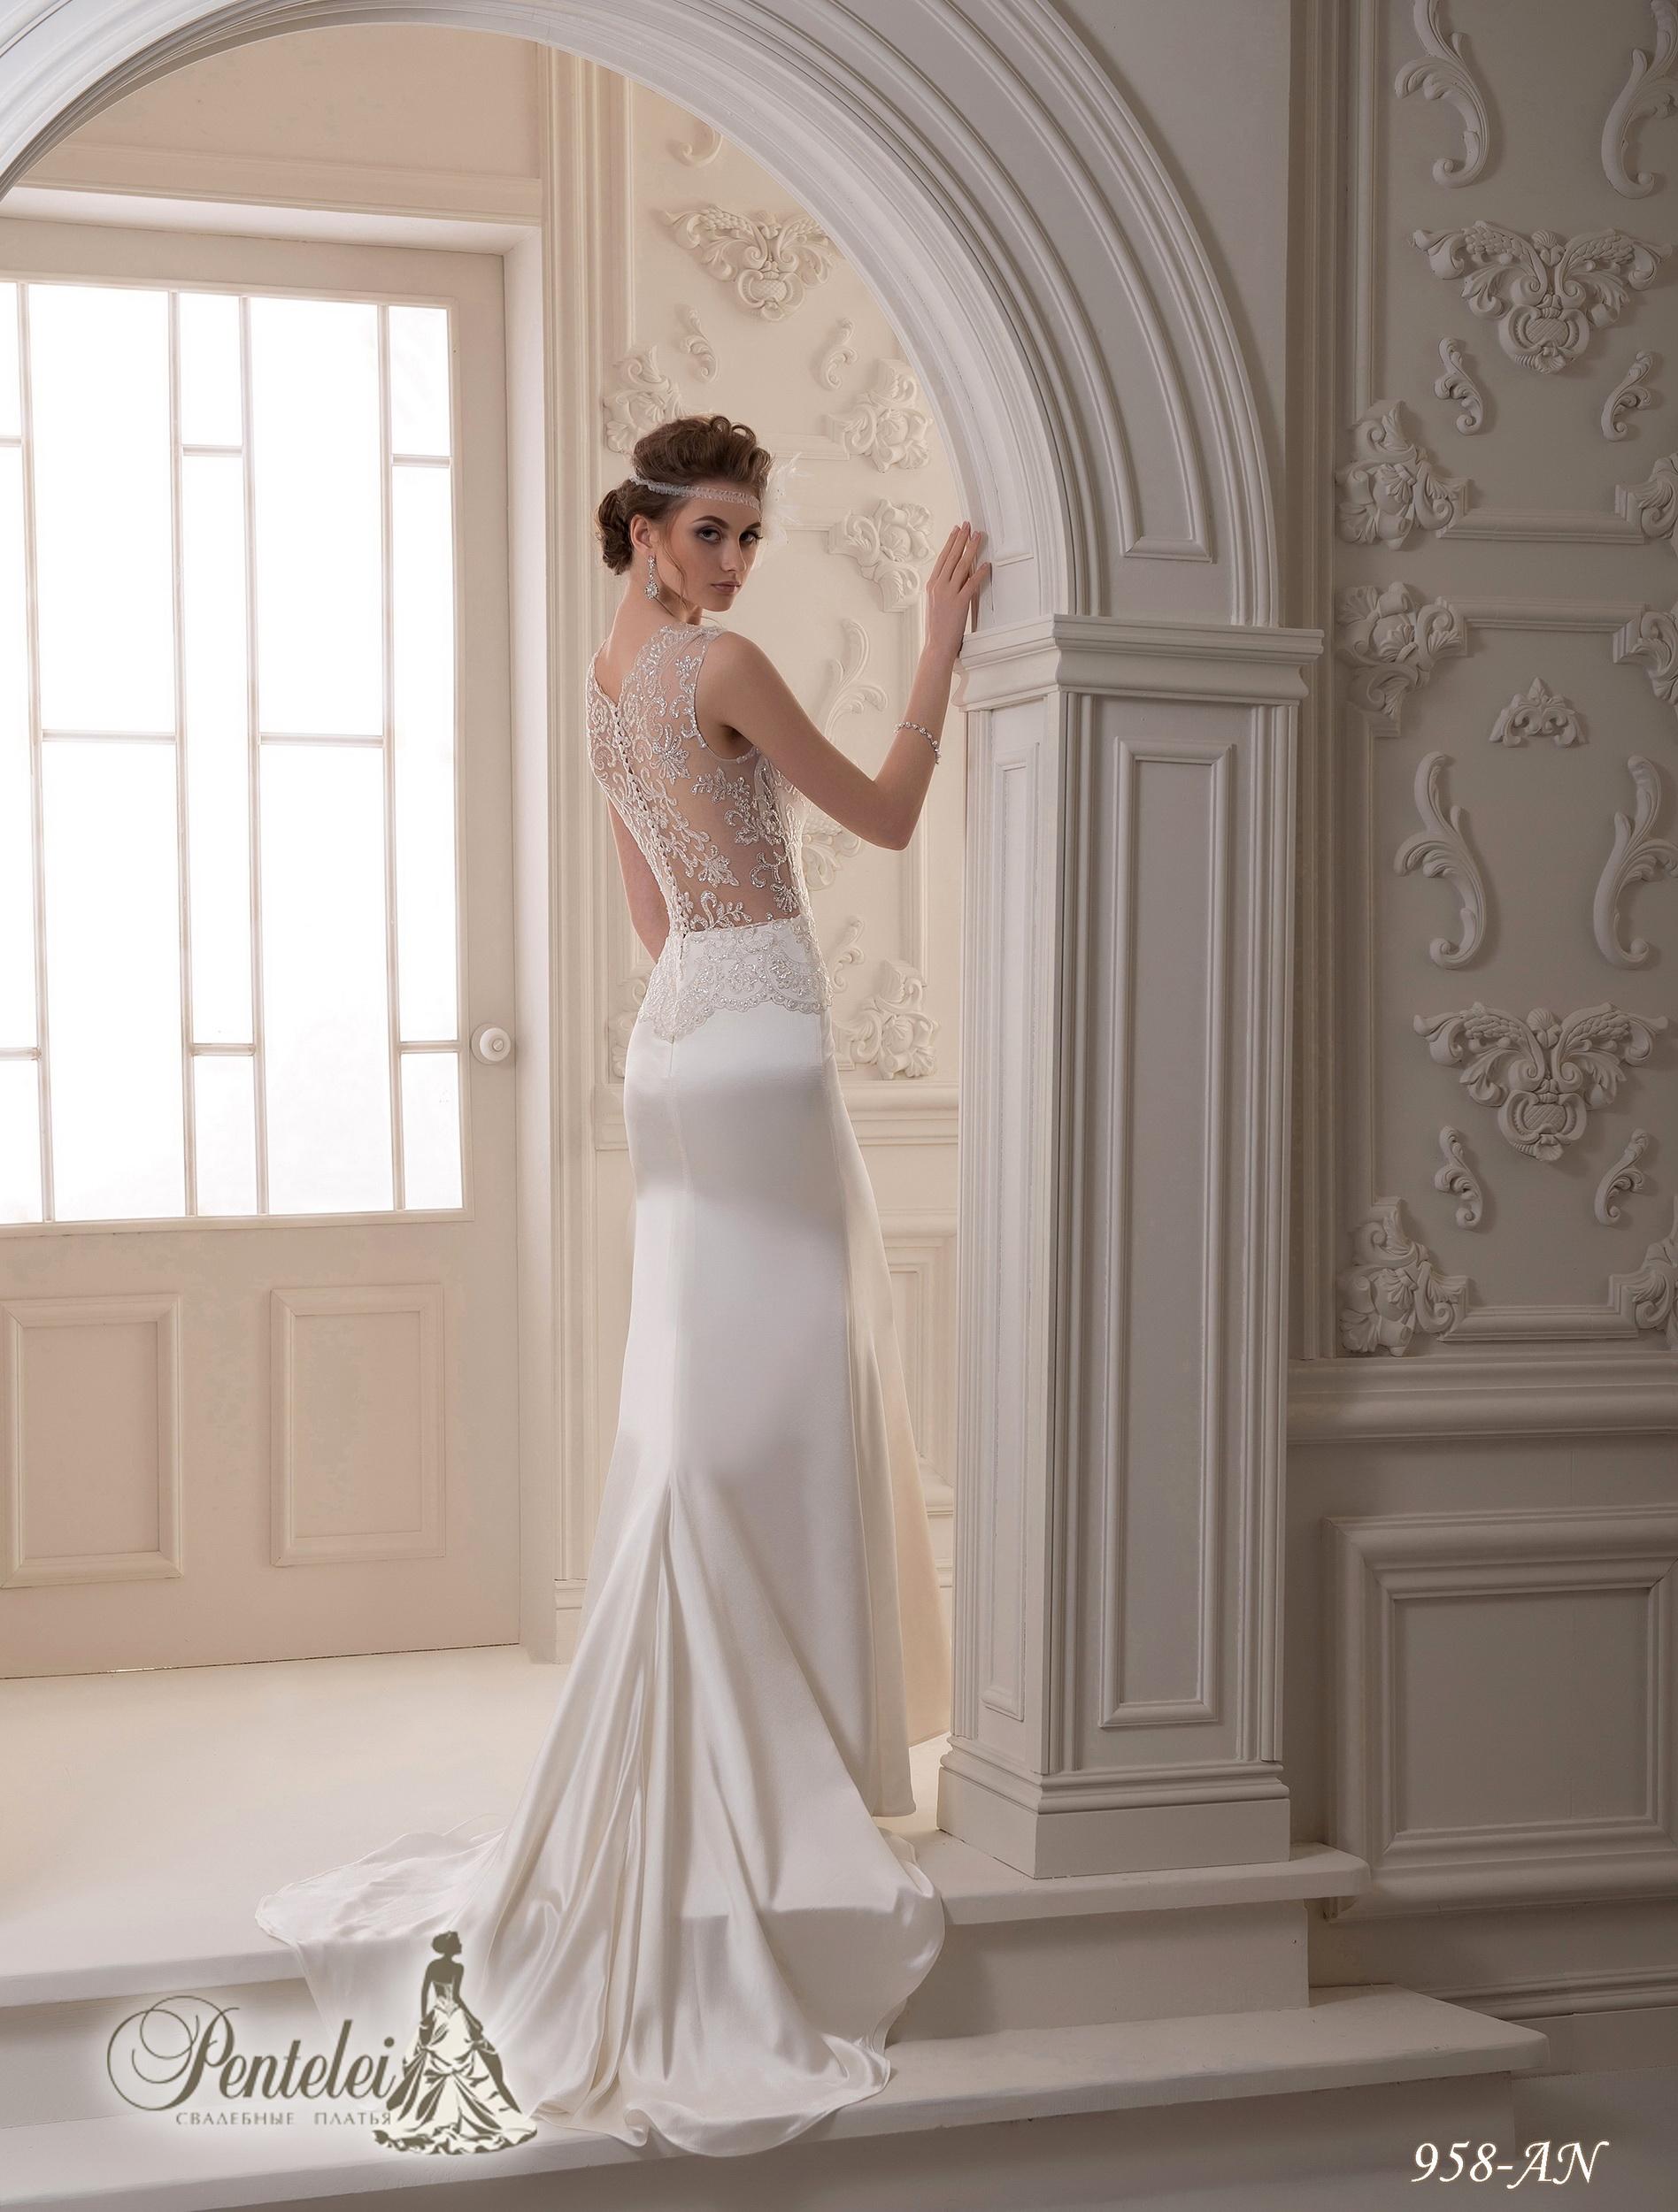 958-AN | Buy wedding dresses wholesale from Pentelei